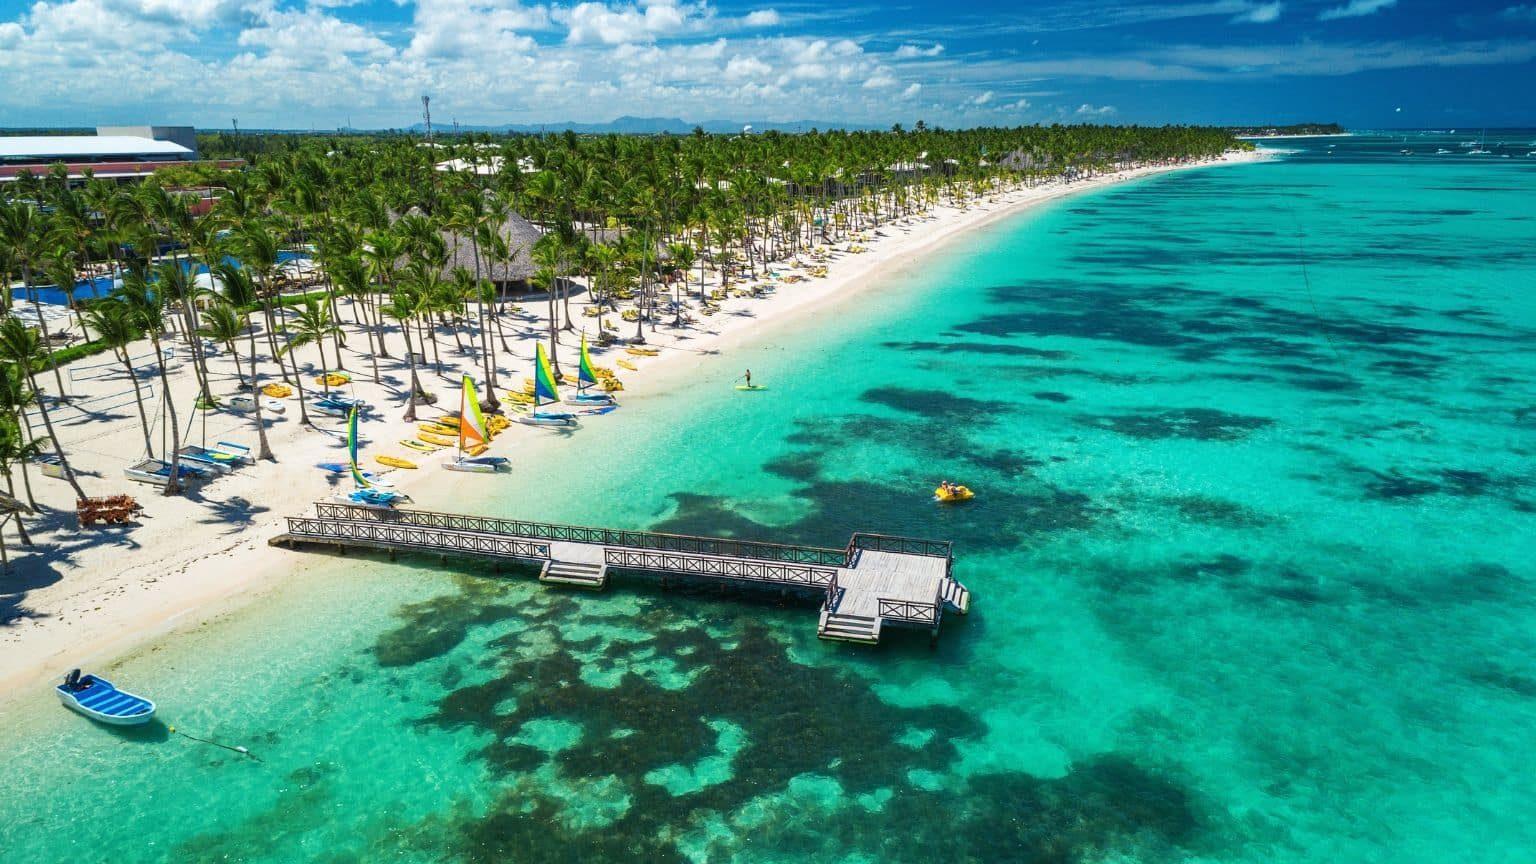 Aerial view of resort in Dominican Republic